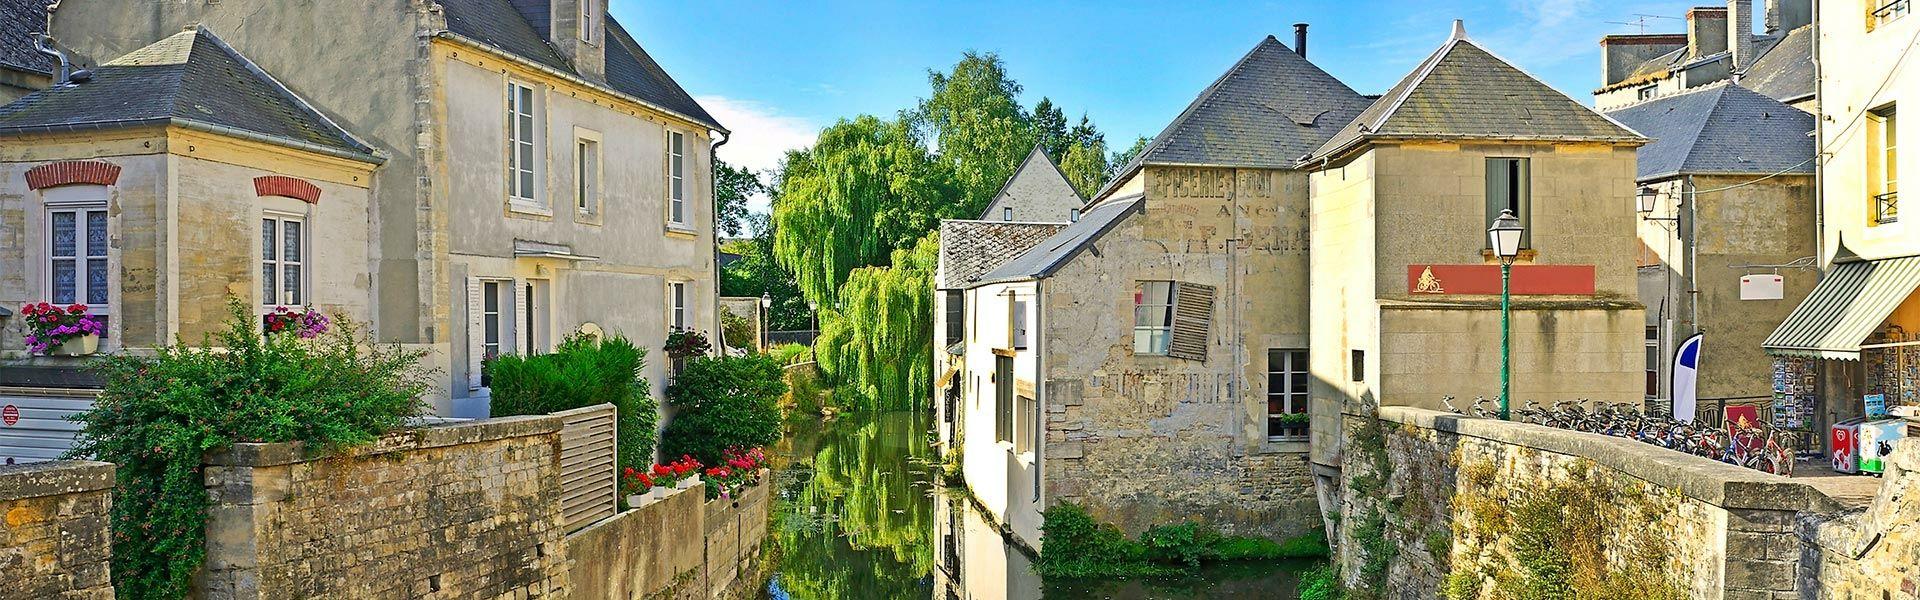 Camping Bayeux